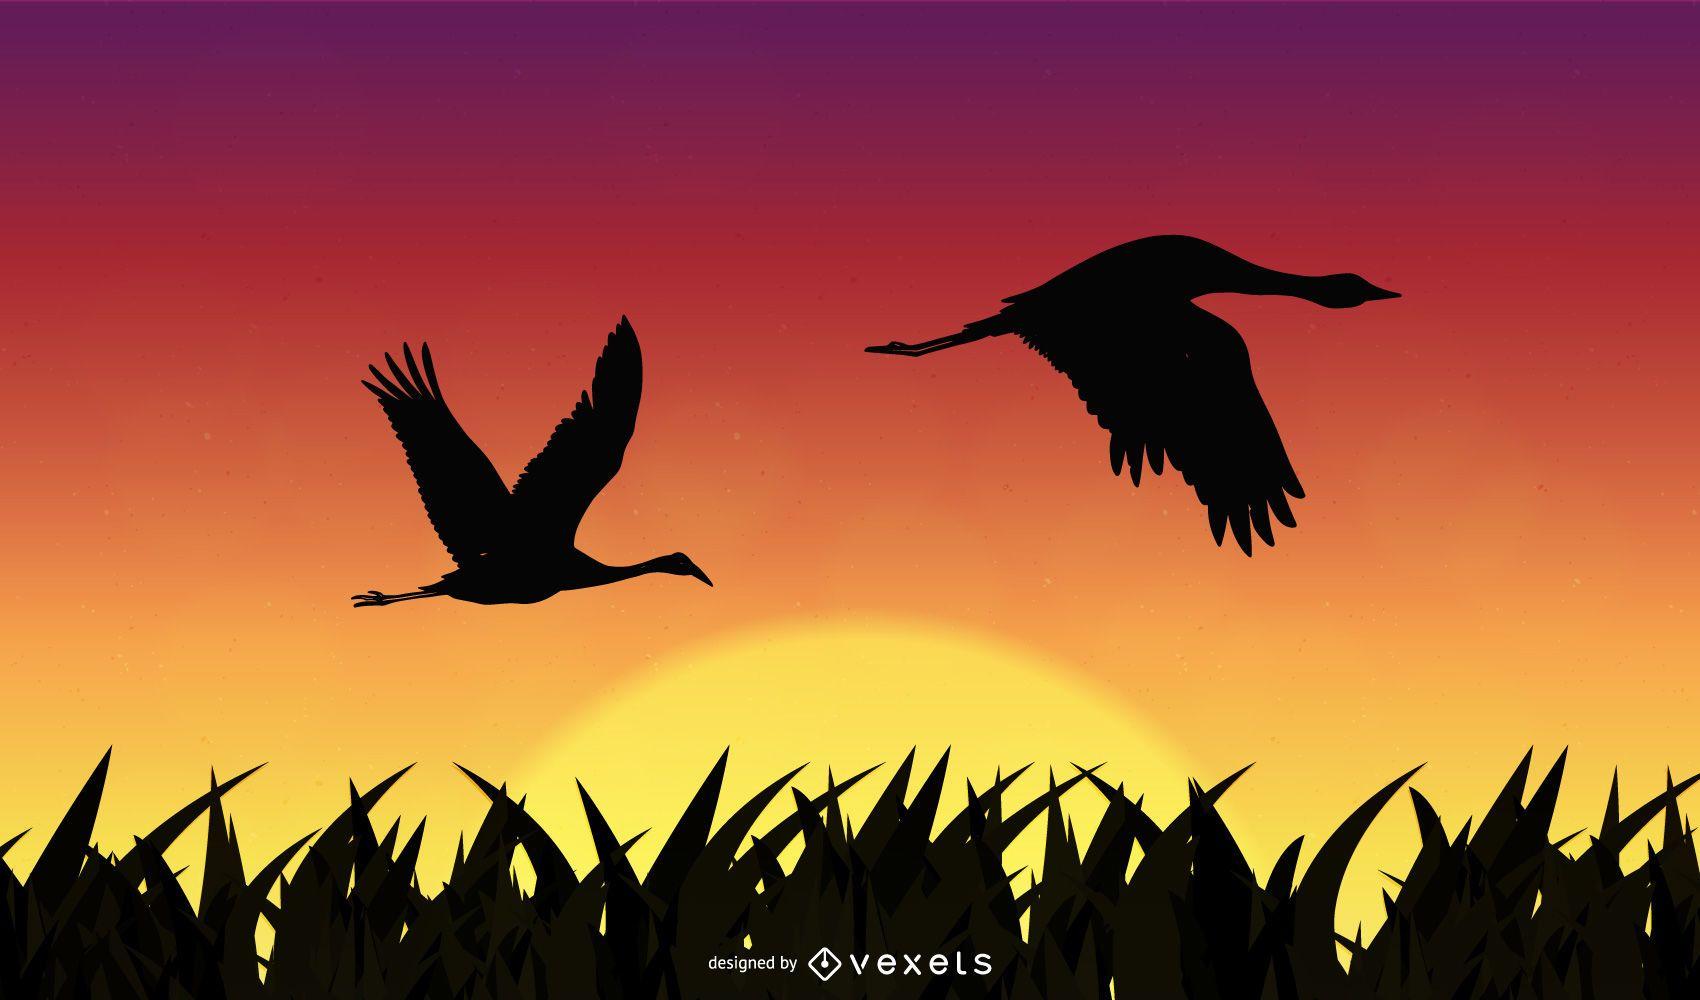 Sunshine with flying birds